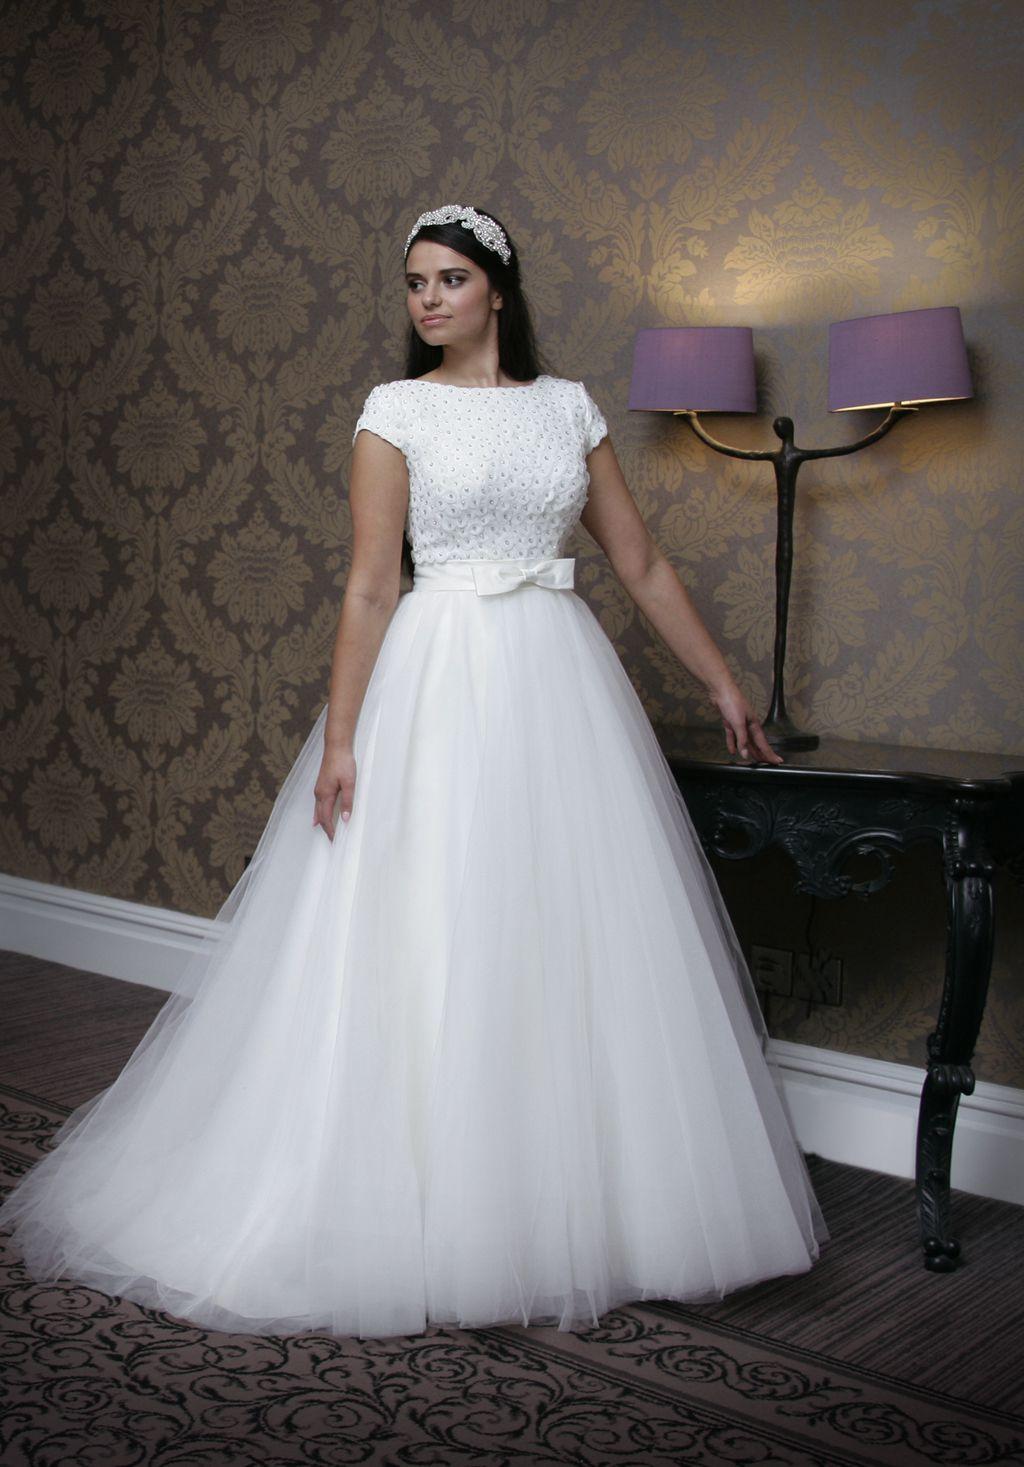 catherine-parry-daisy-daisy-bridal-1509_Y6R0286_c_LR